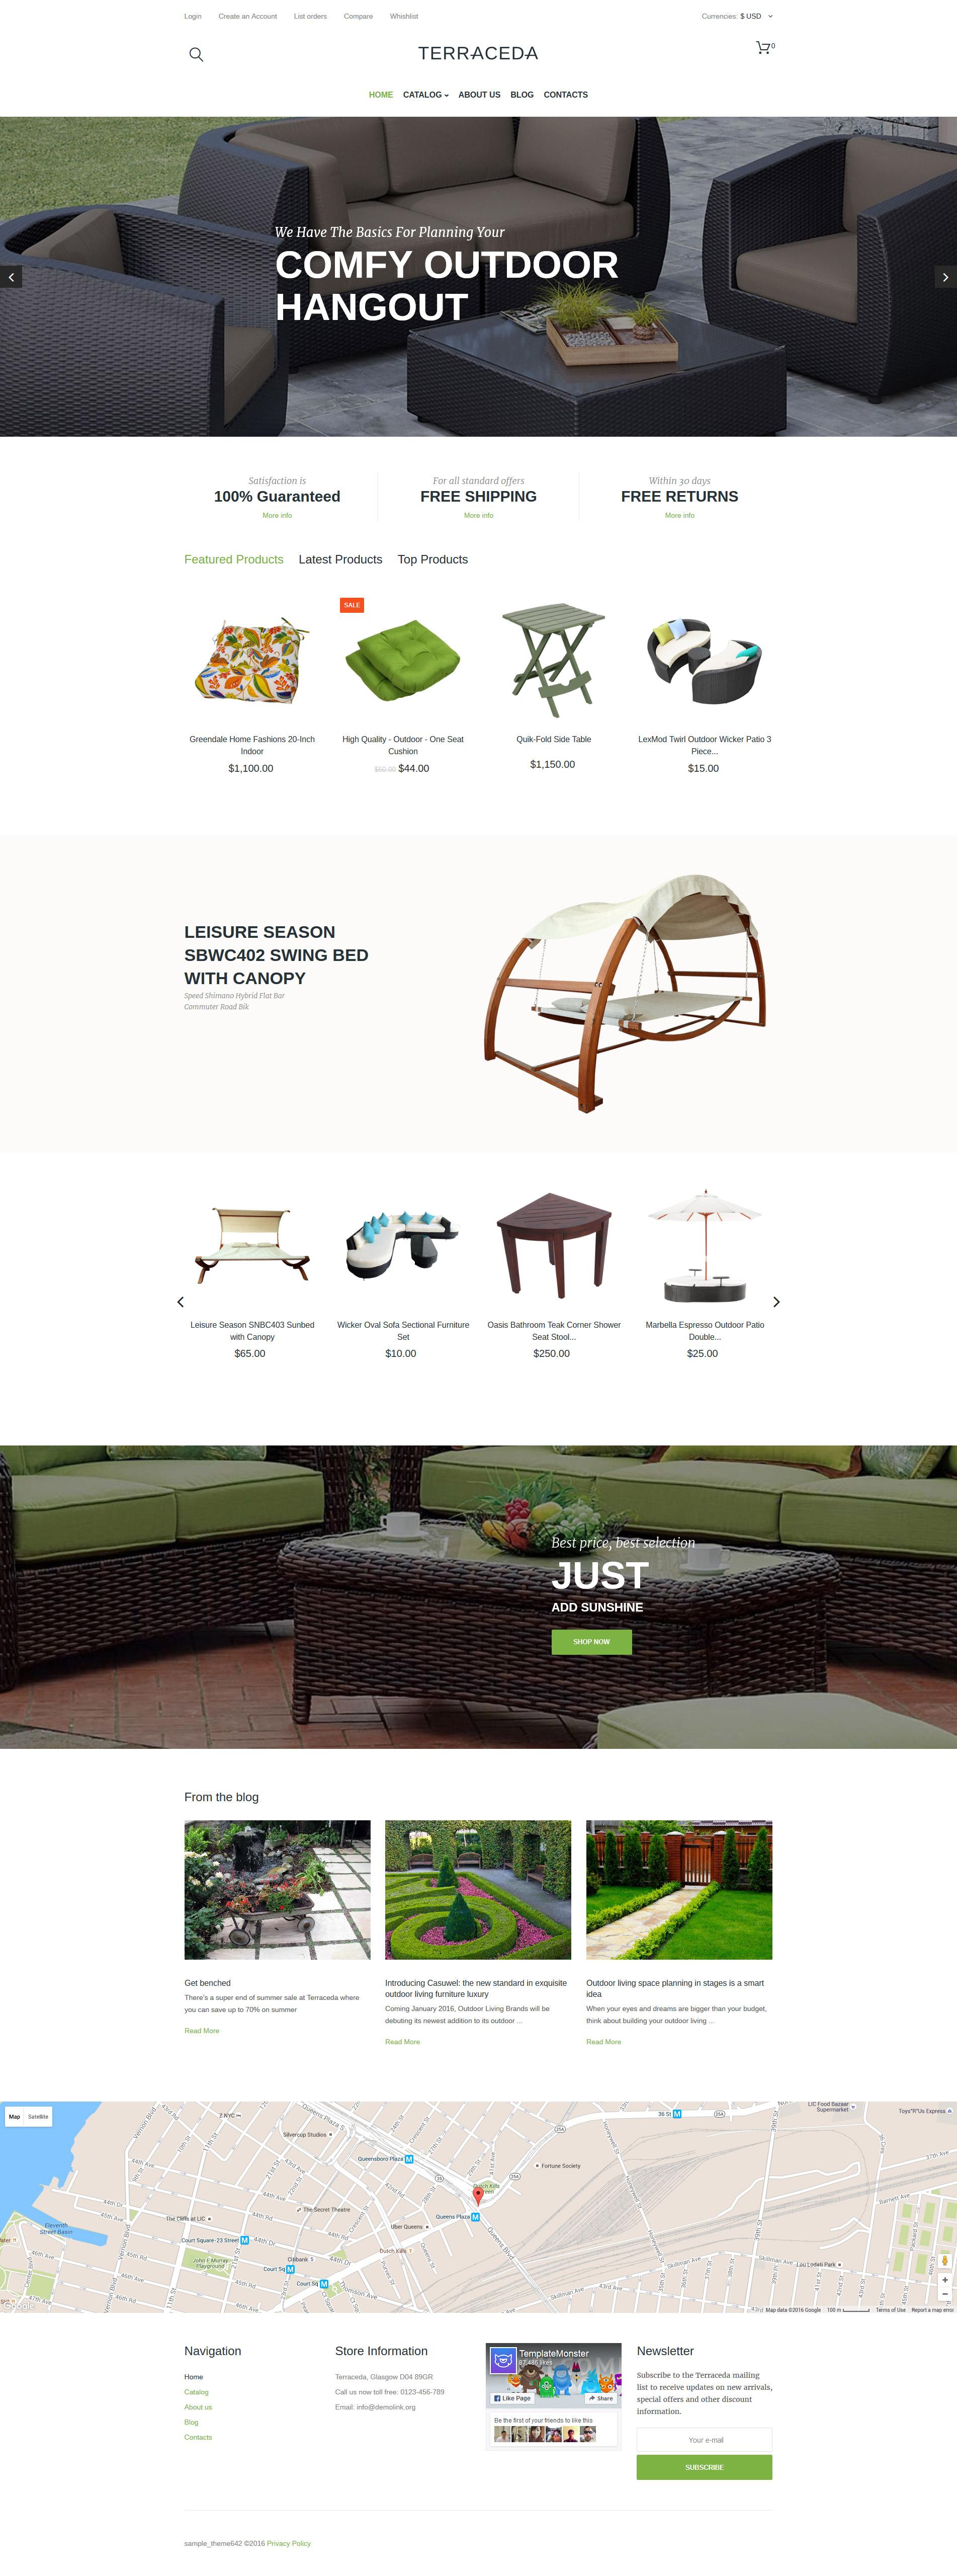 Szablon VirtueMart Terraceda #60000 - zrzut ekranu